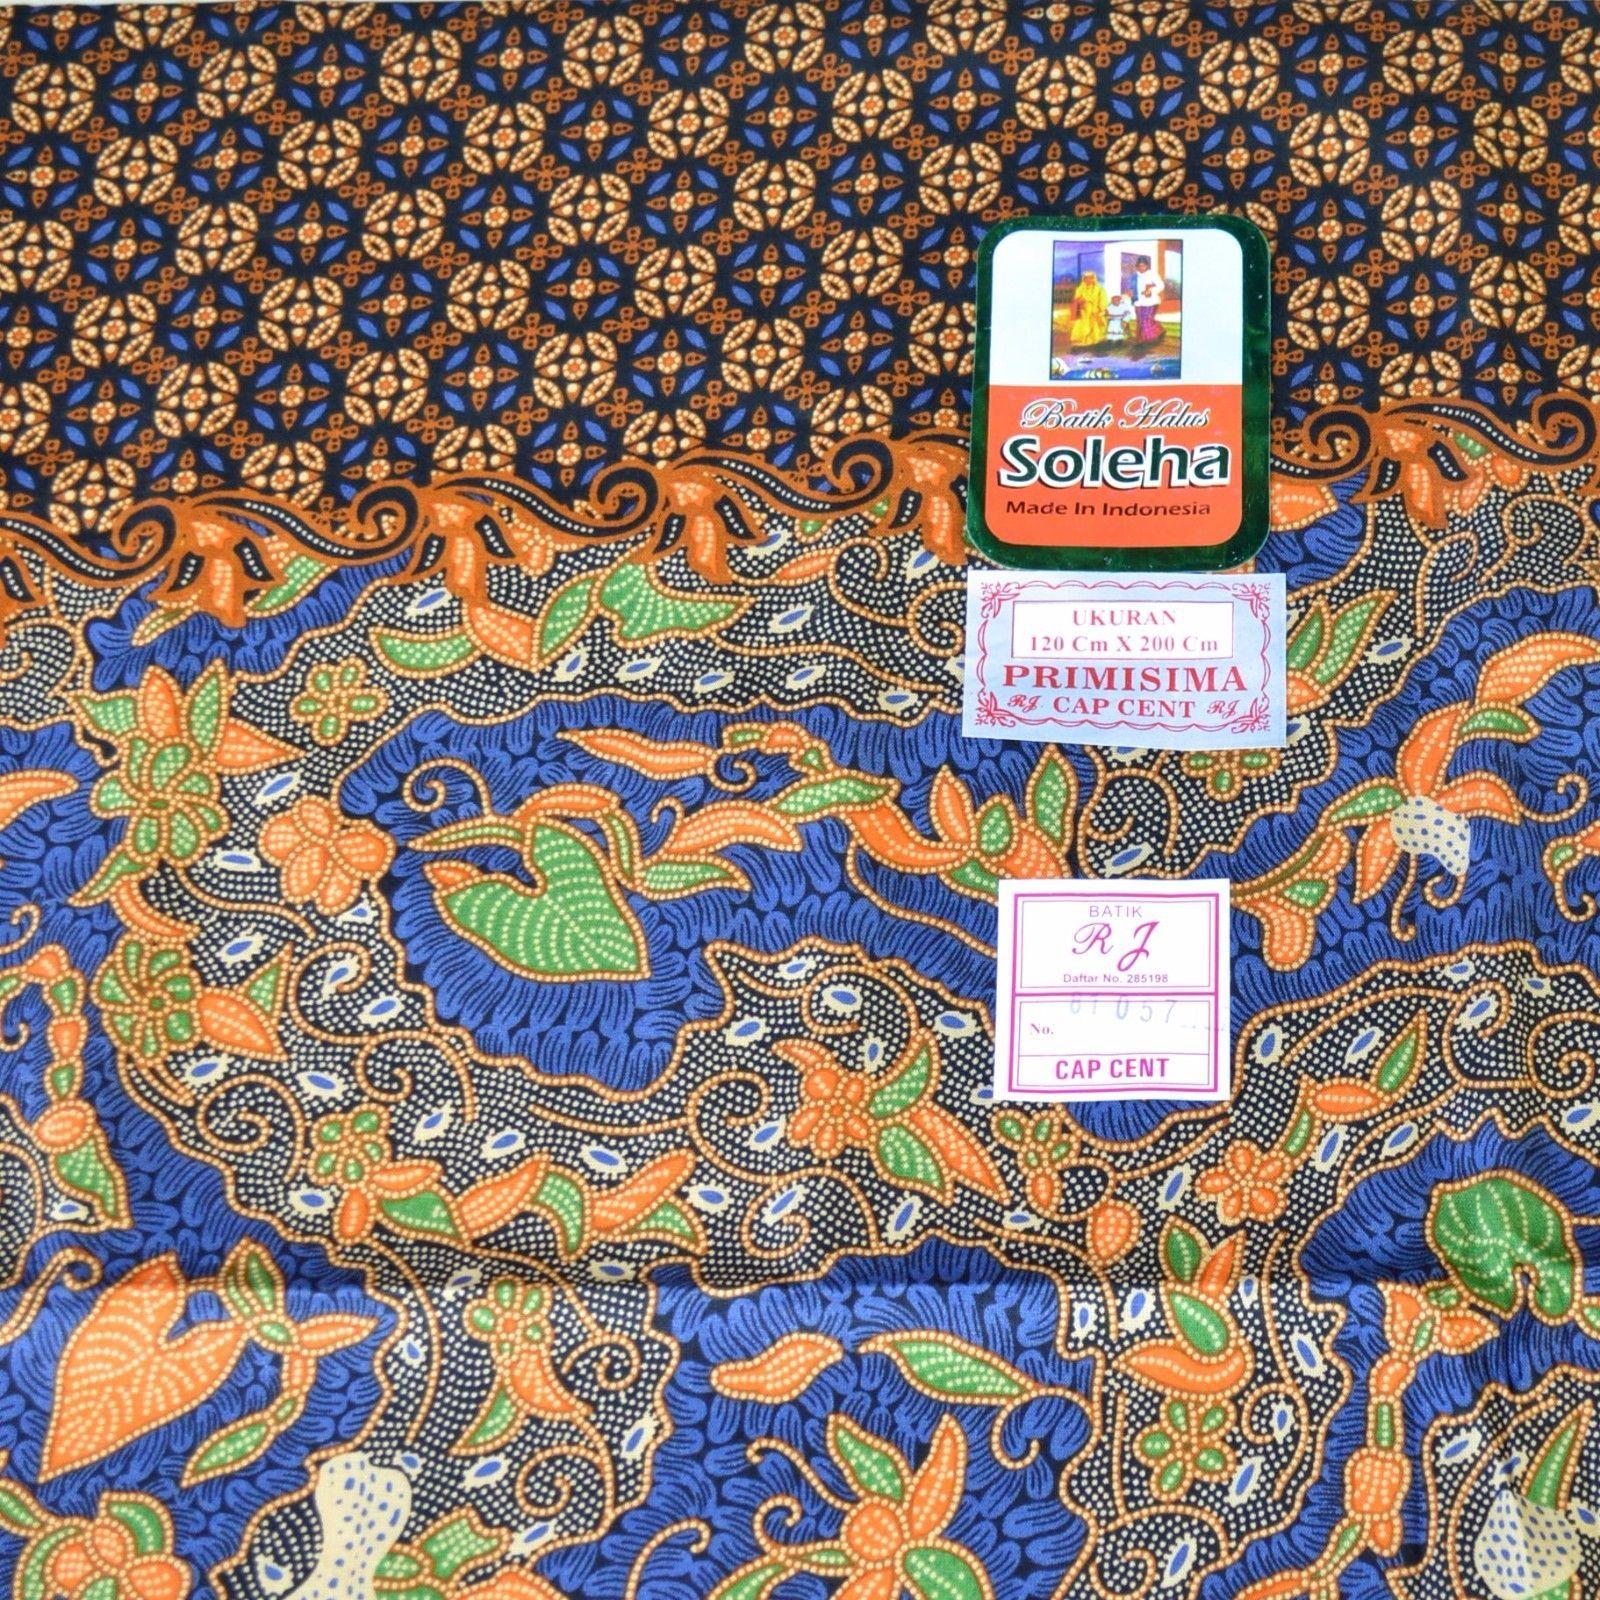 Batik Indonesia Flower Printing Sarong Cotton Fabric BP 29